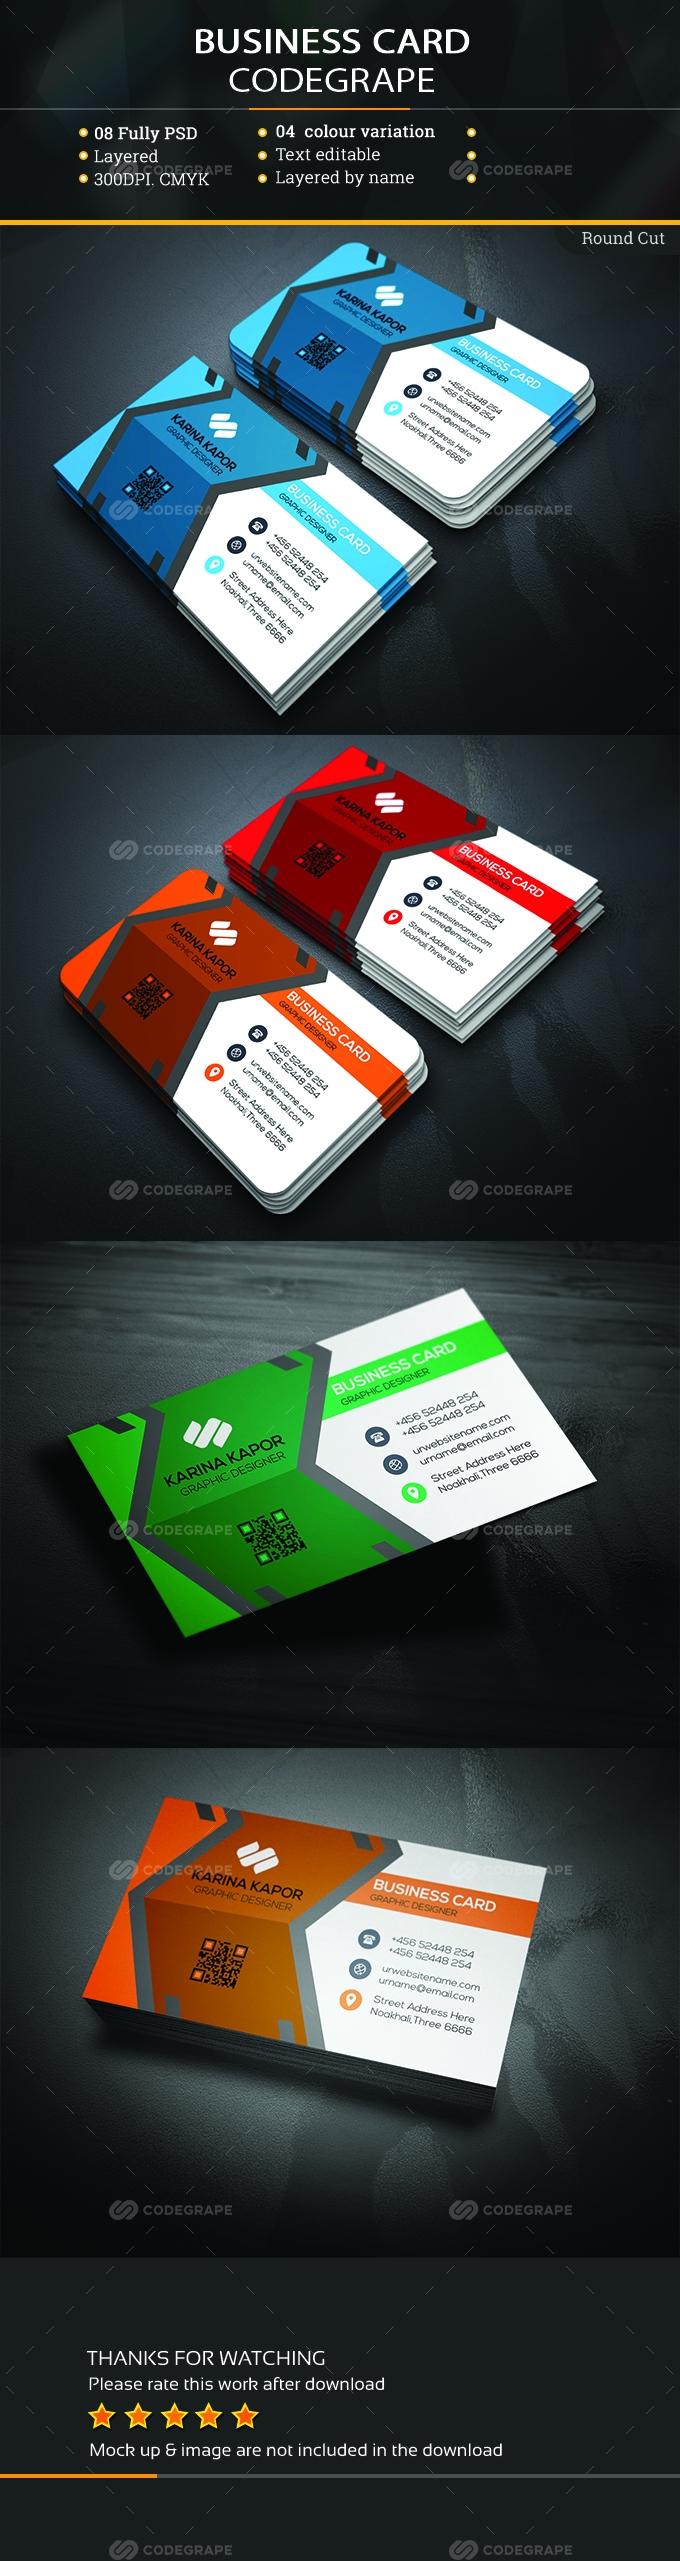 Single Business Card